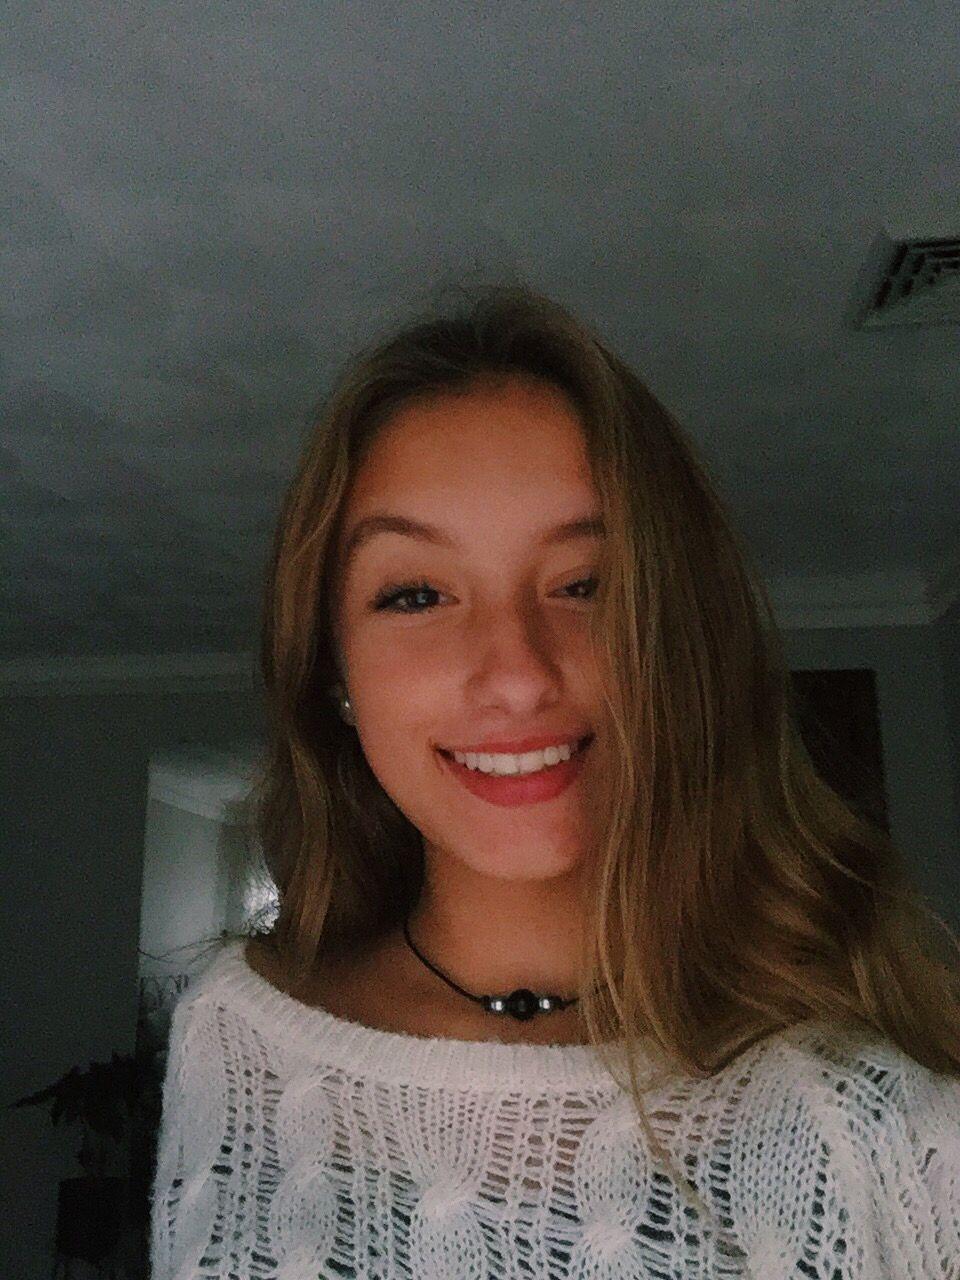 Pin By Karys On Pics To Take Pretty Girls Selfies Catfish Girl Cute Selfie Ideas